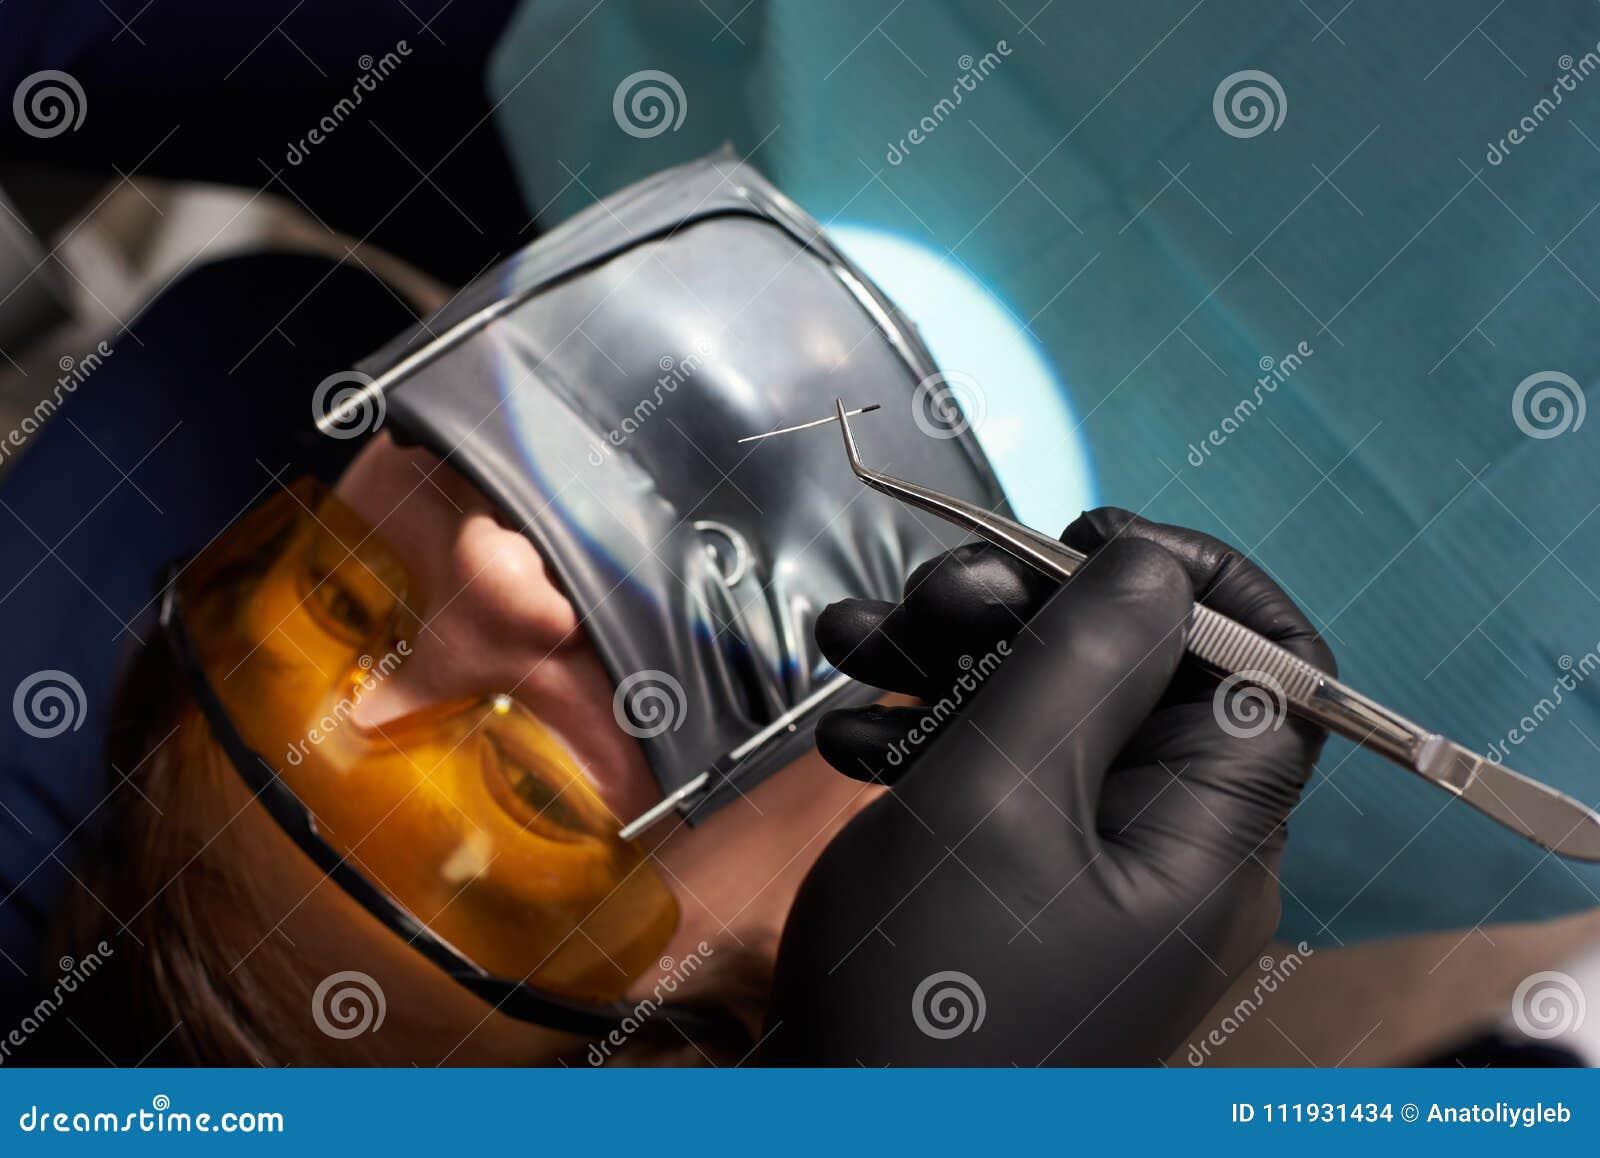 Dentist in black gloves holds tweezers over patient using cofferdam